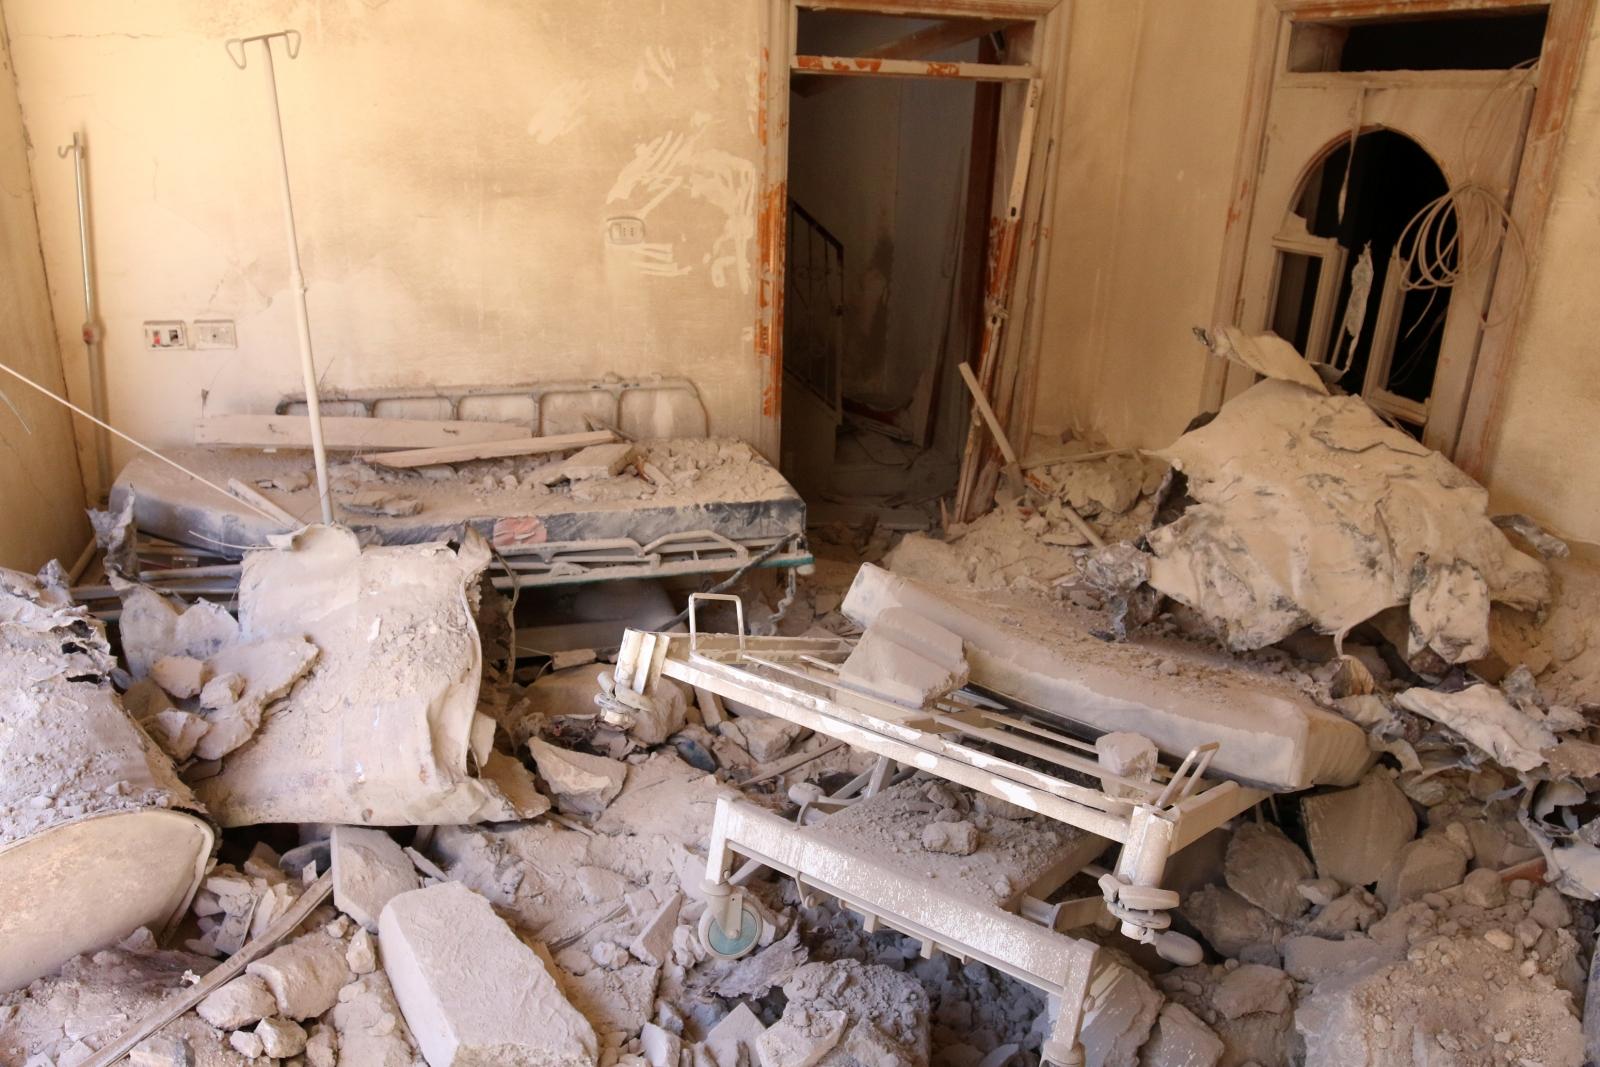 Syrian regime bombs hospital